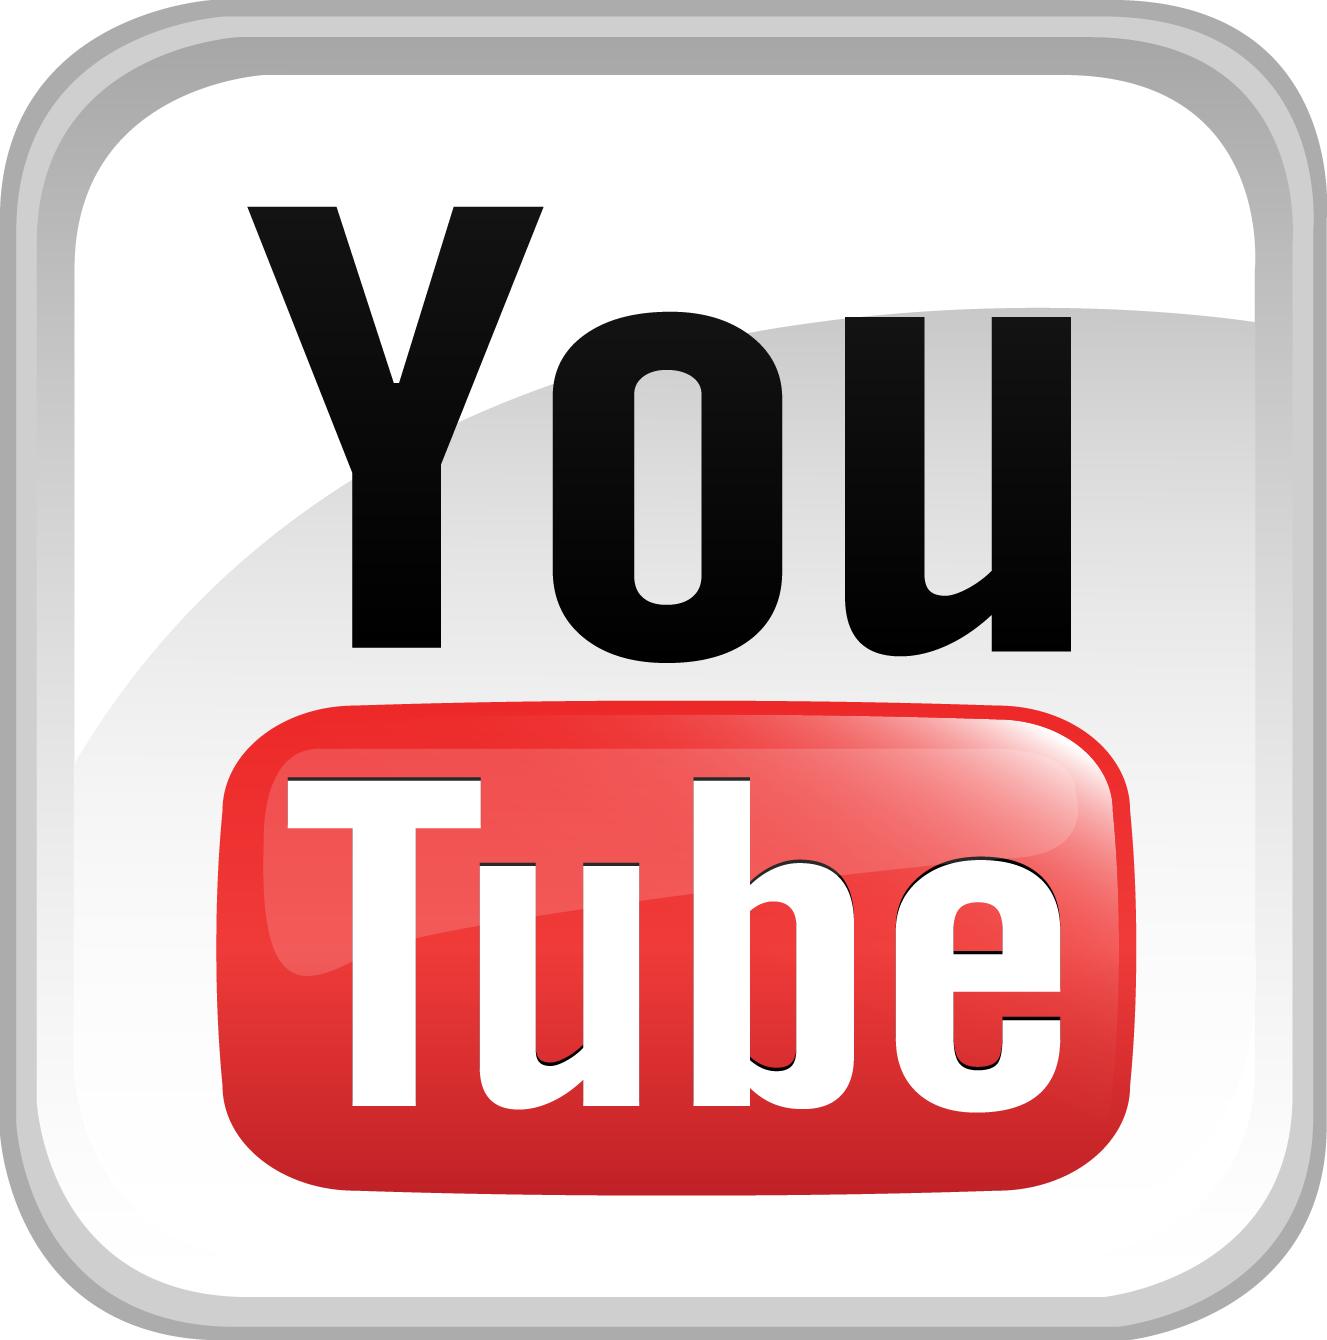 Carnaval de olinda será transmitido pelo youtube